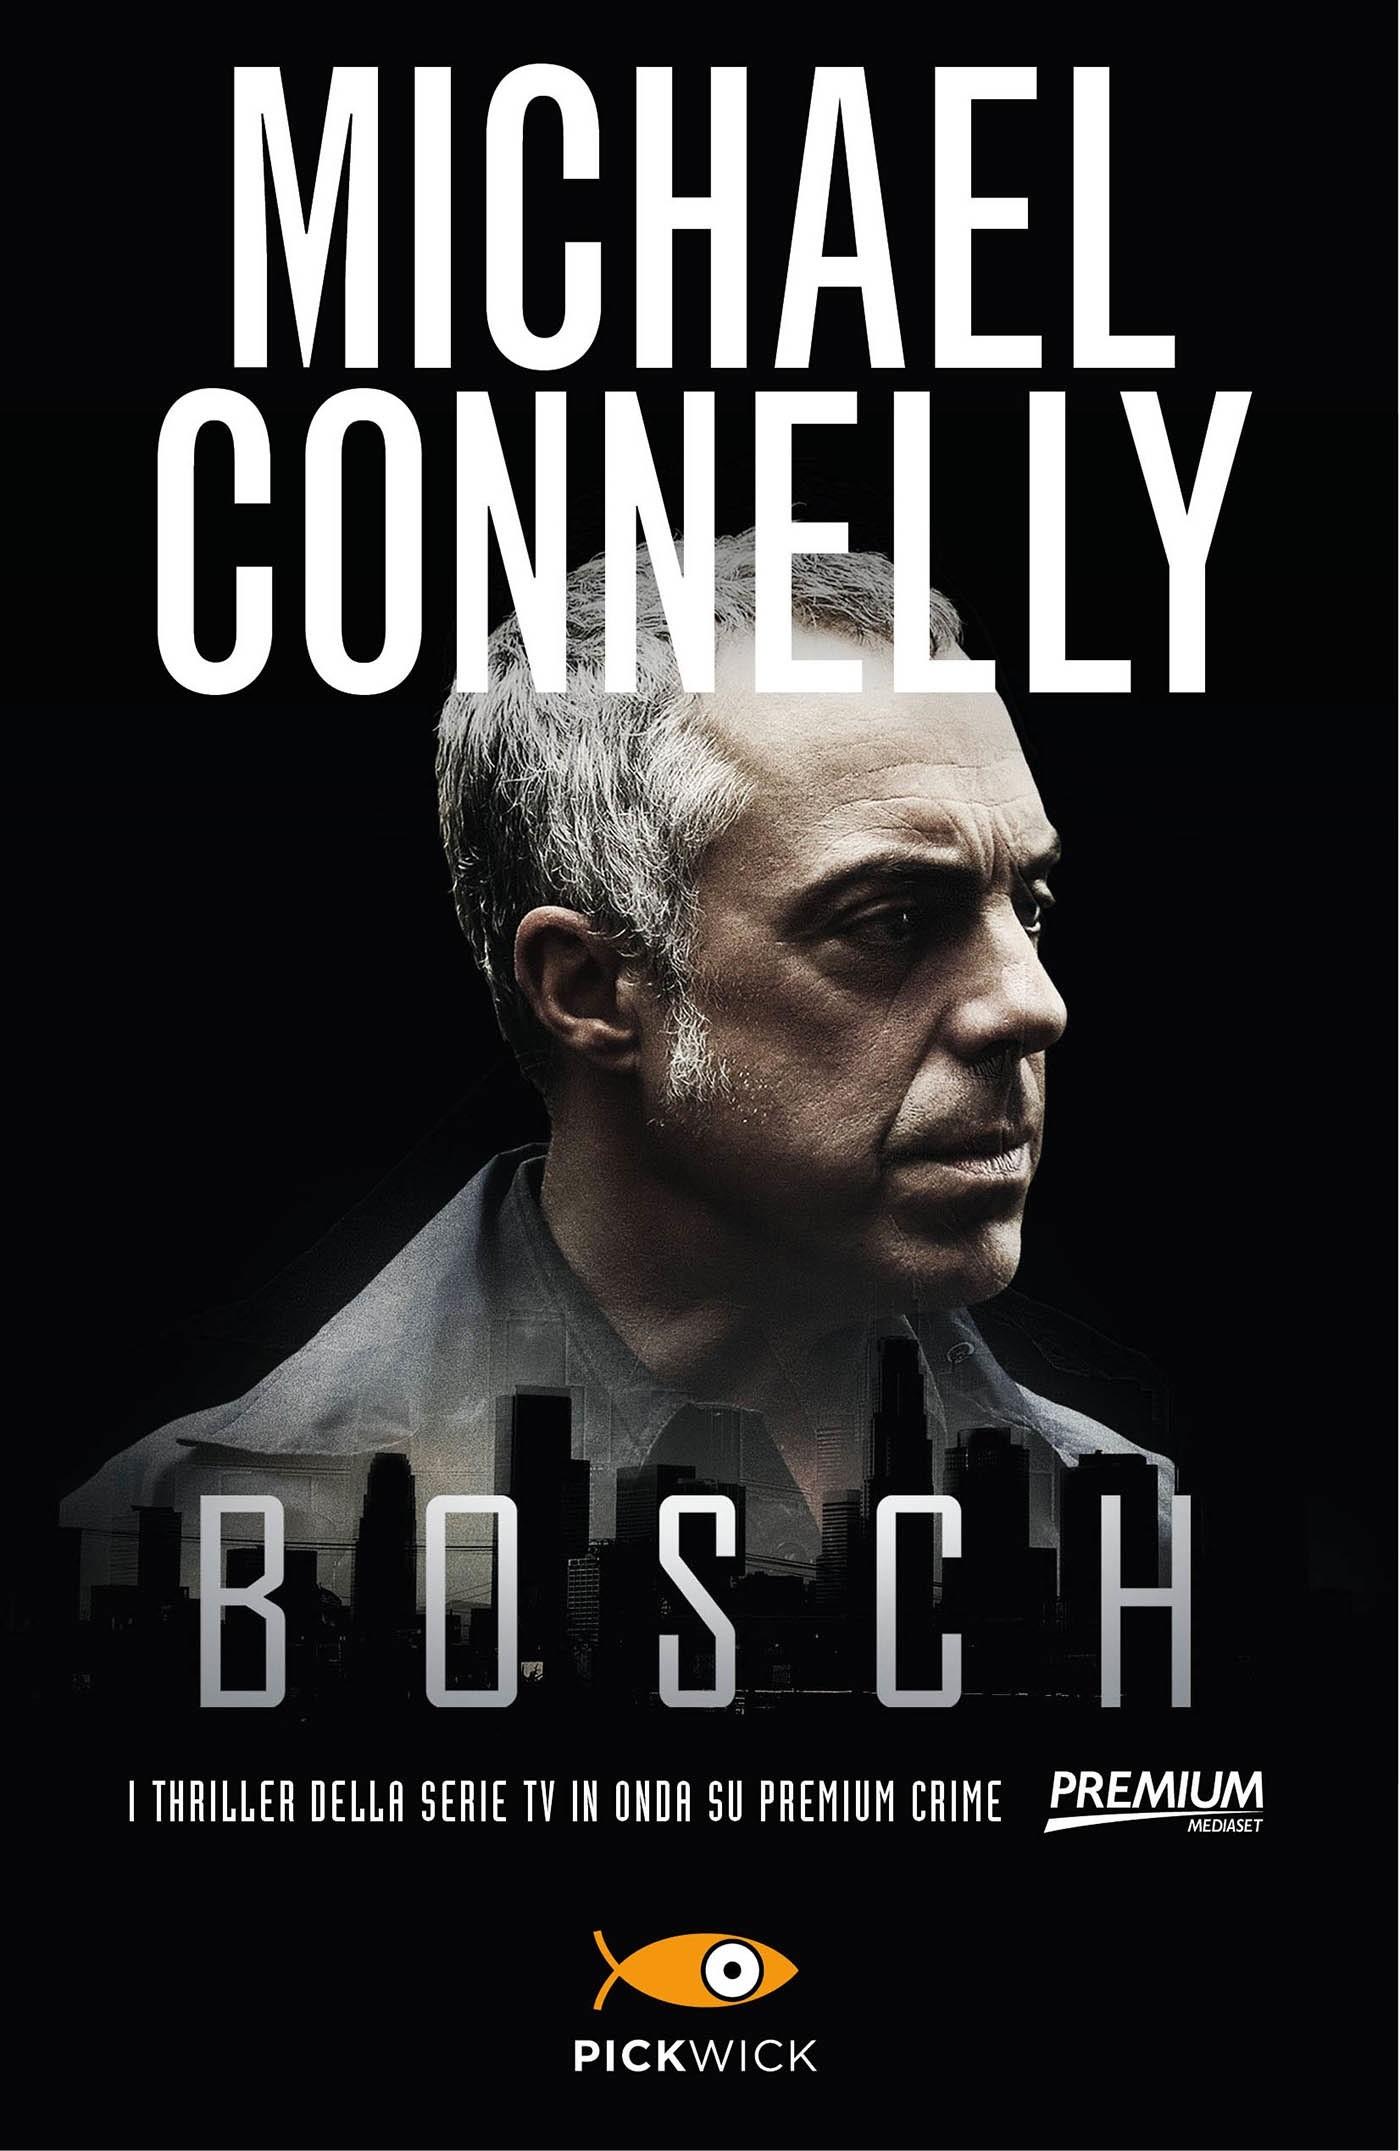 Bosch, Michael Connelly   Ebook Bookrepublic